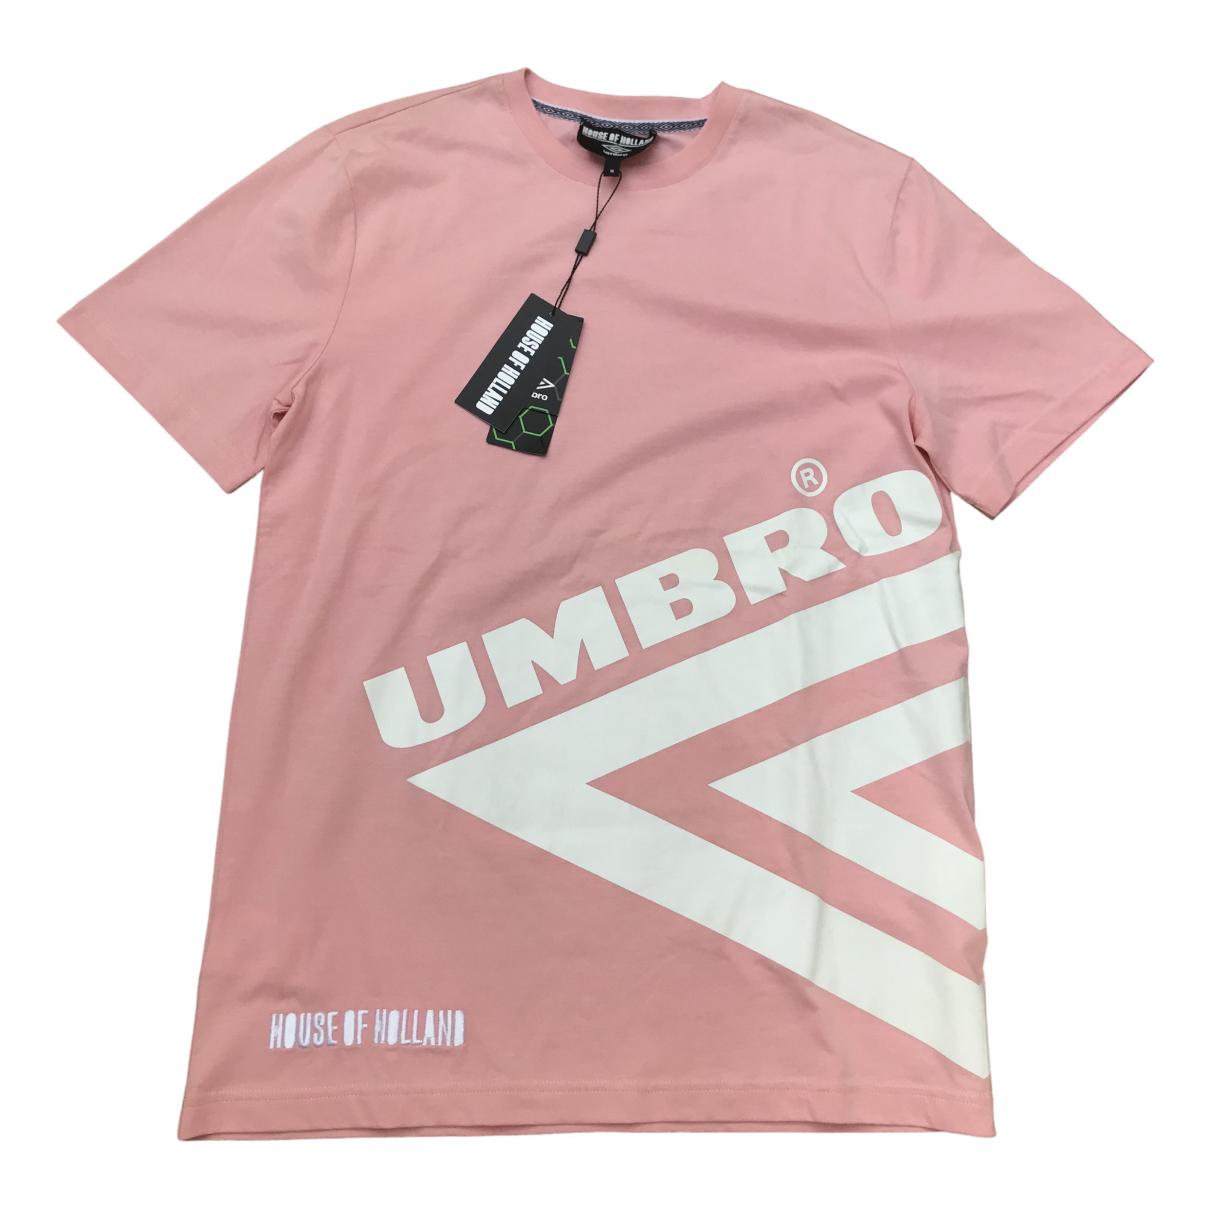 Umbro - Tee shirts   pour homme en coton - rose